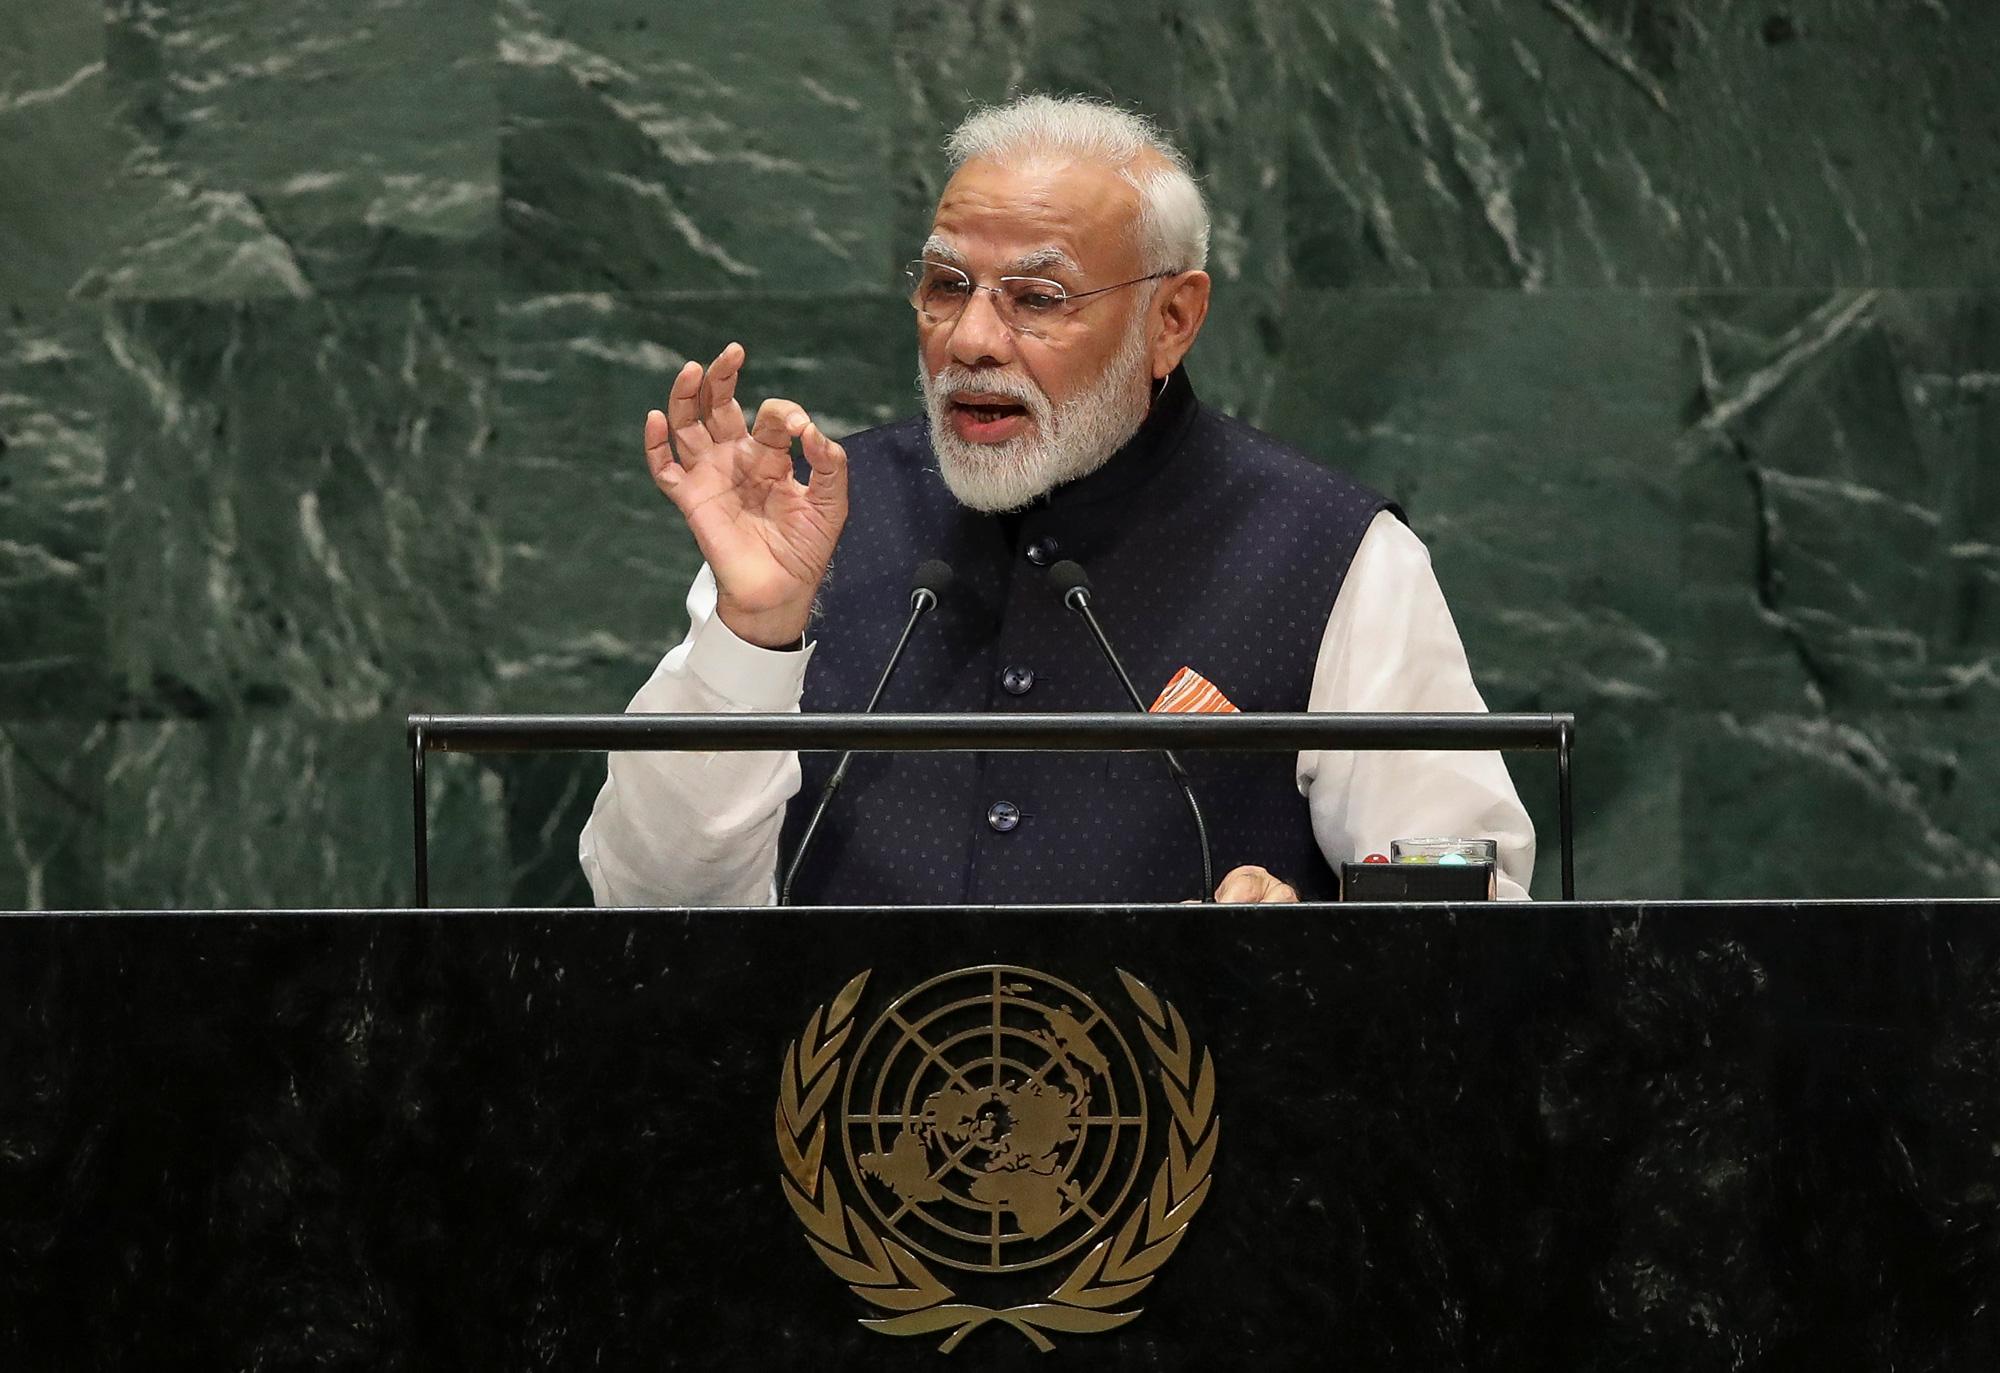 Prime Minister of India Narendra Modi speaks at UN headquarters on September 27, 2019, in New York City.